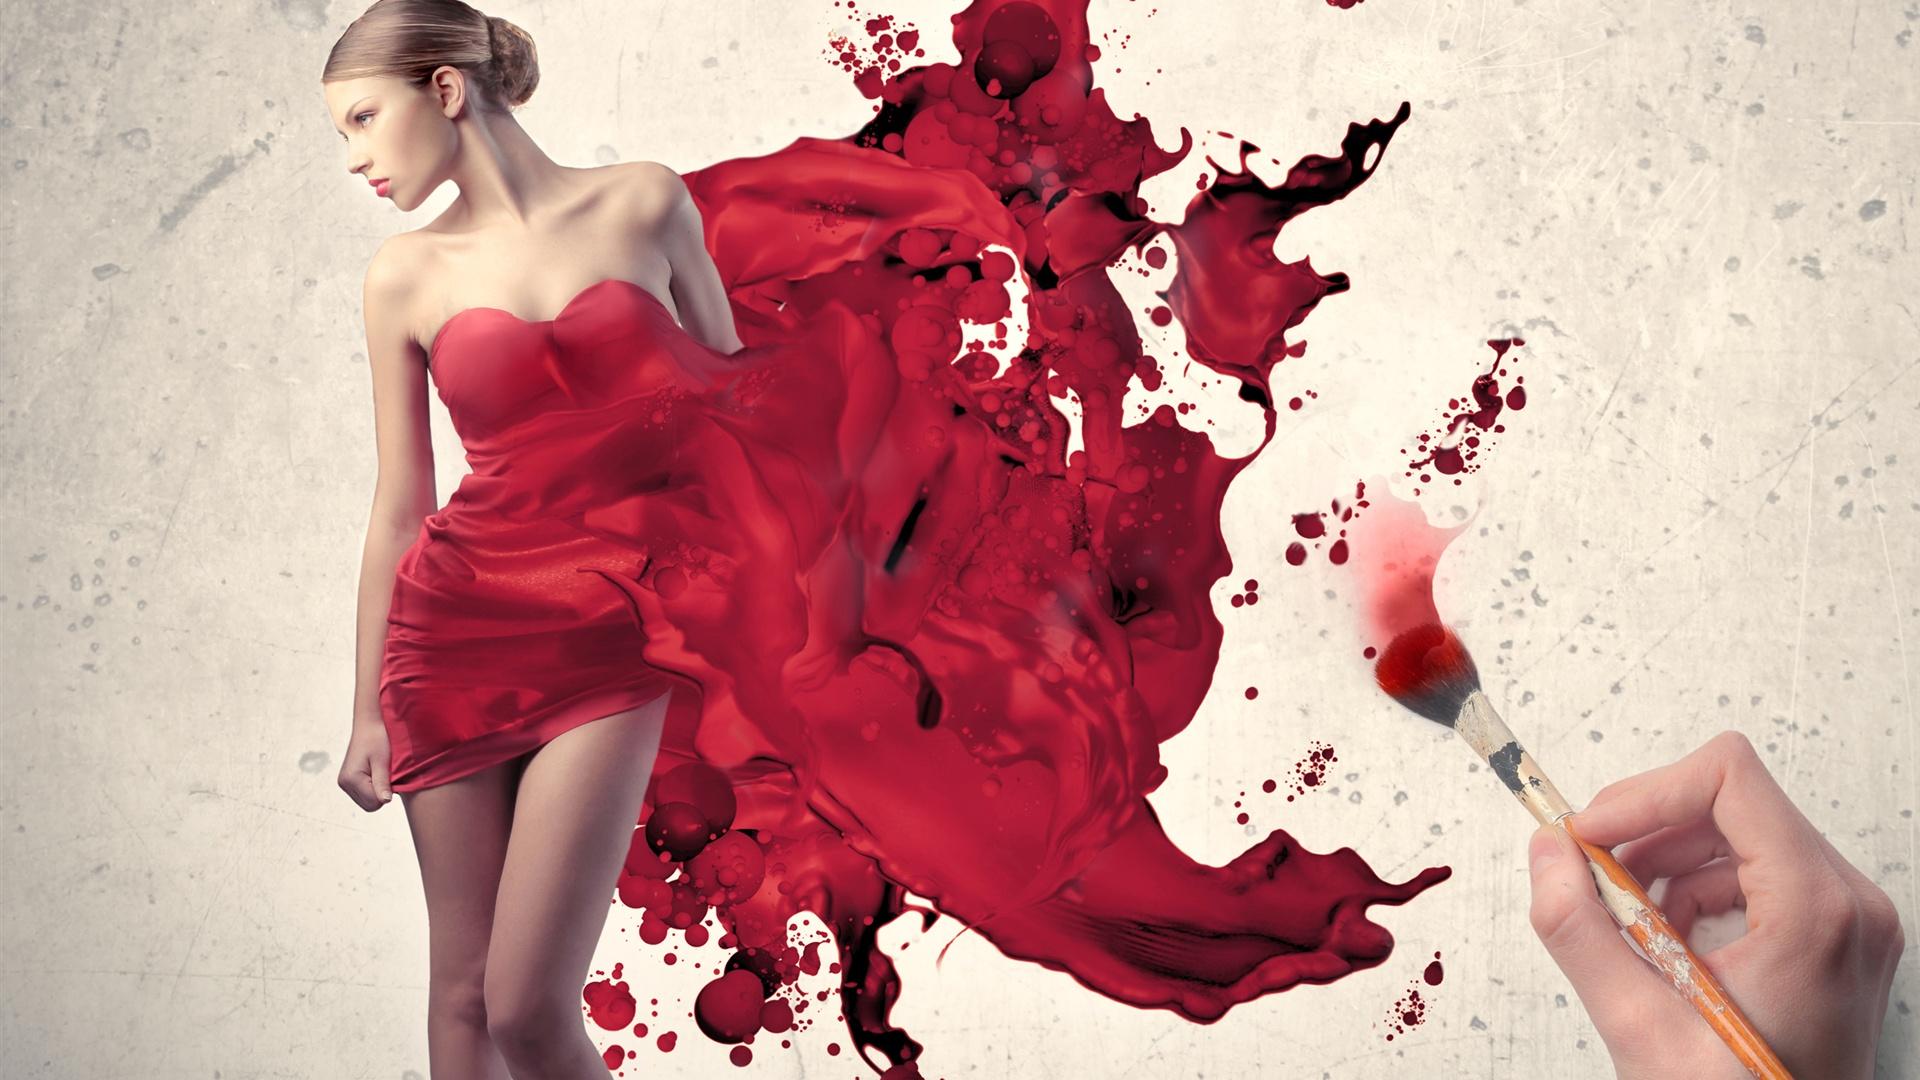 Red Dress Girls HD Wallpapers ...